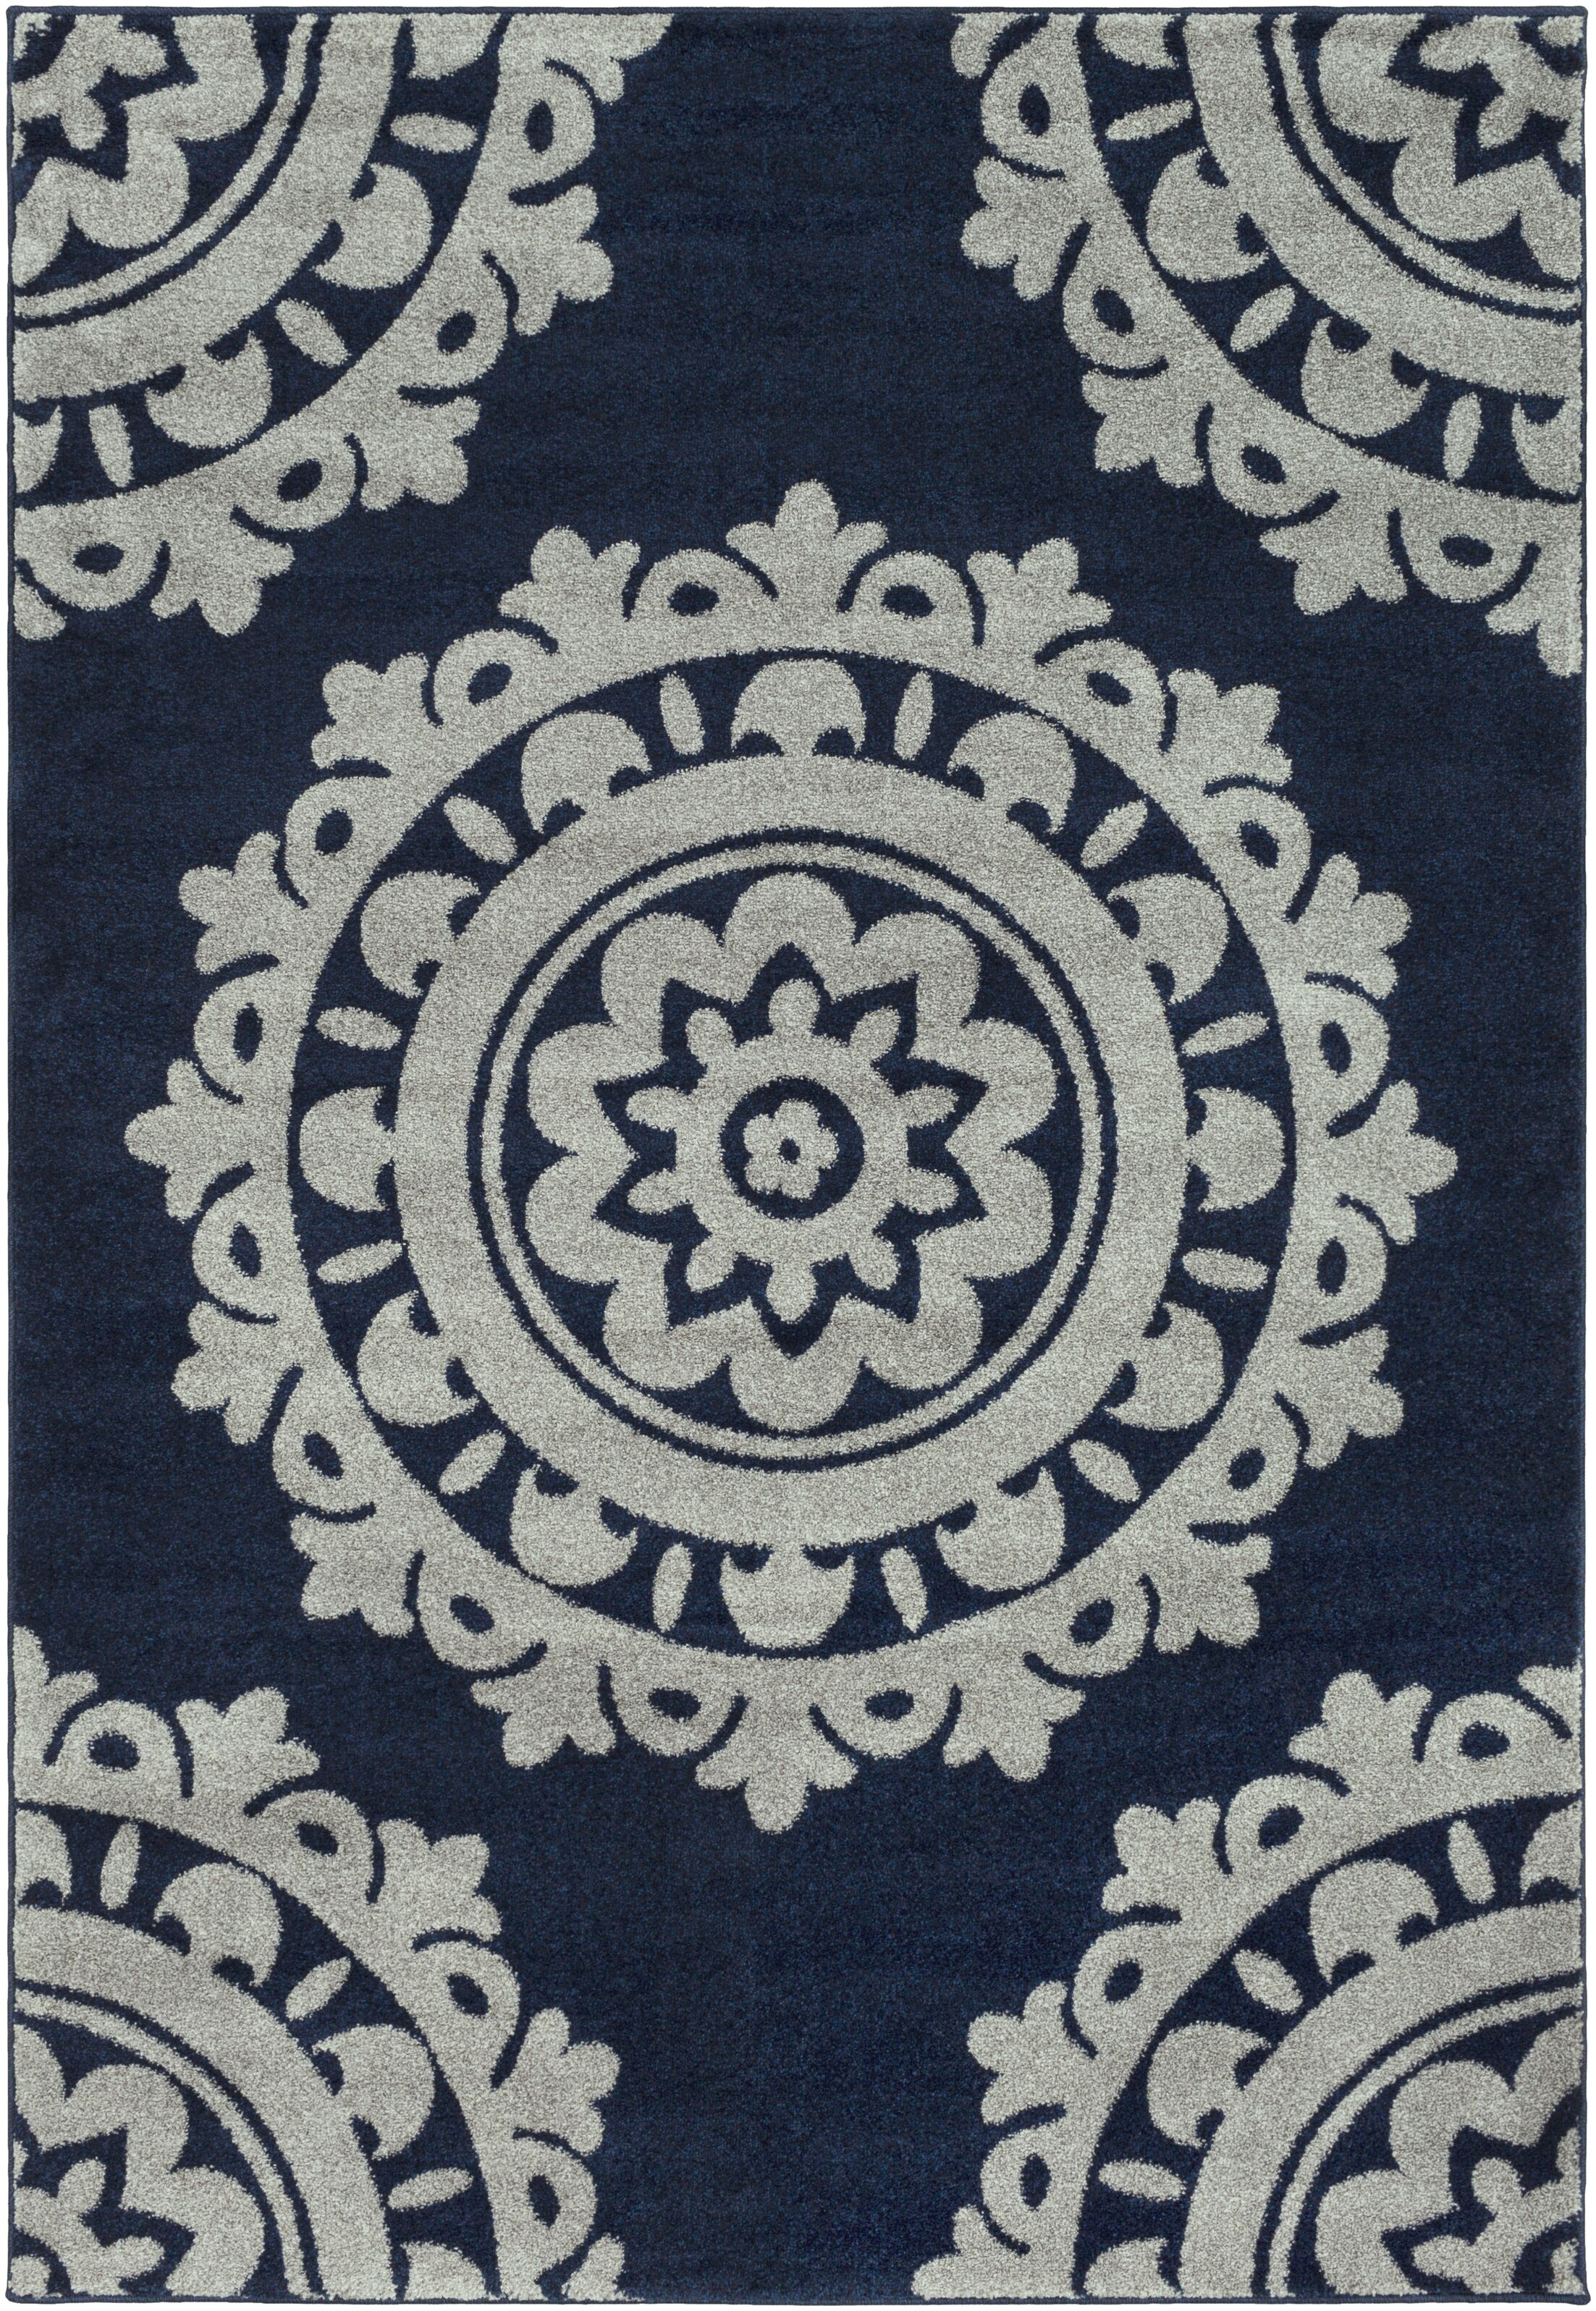 Bickerstaff Dark Blue/Silver Gray Area Rug Rug Size: Rectangle 2' x 3'3